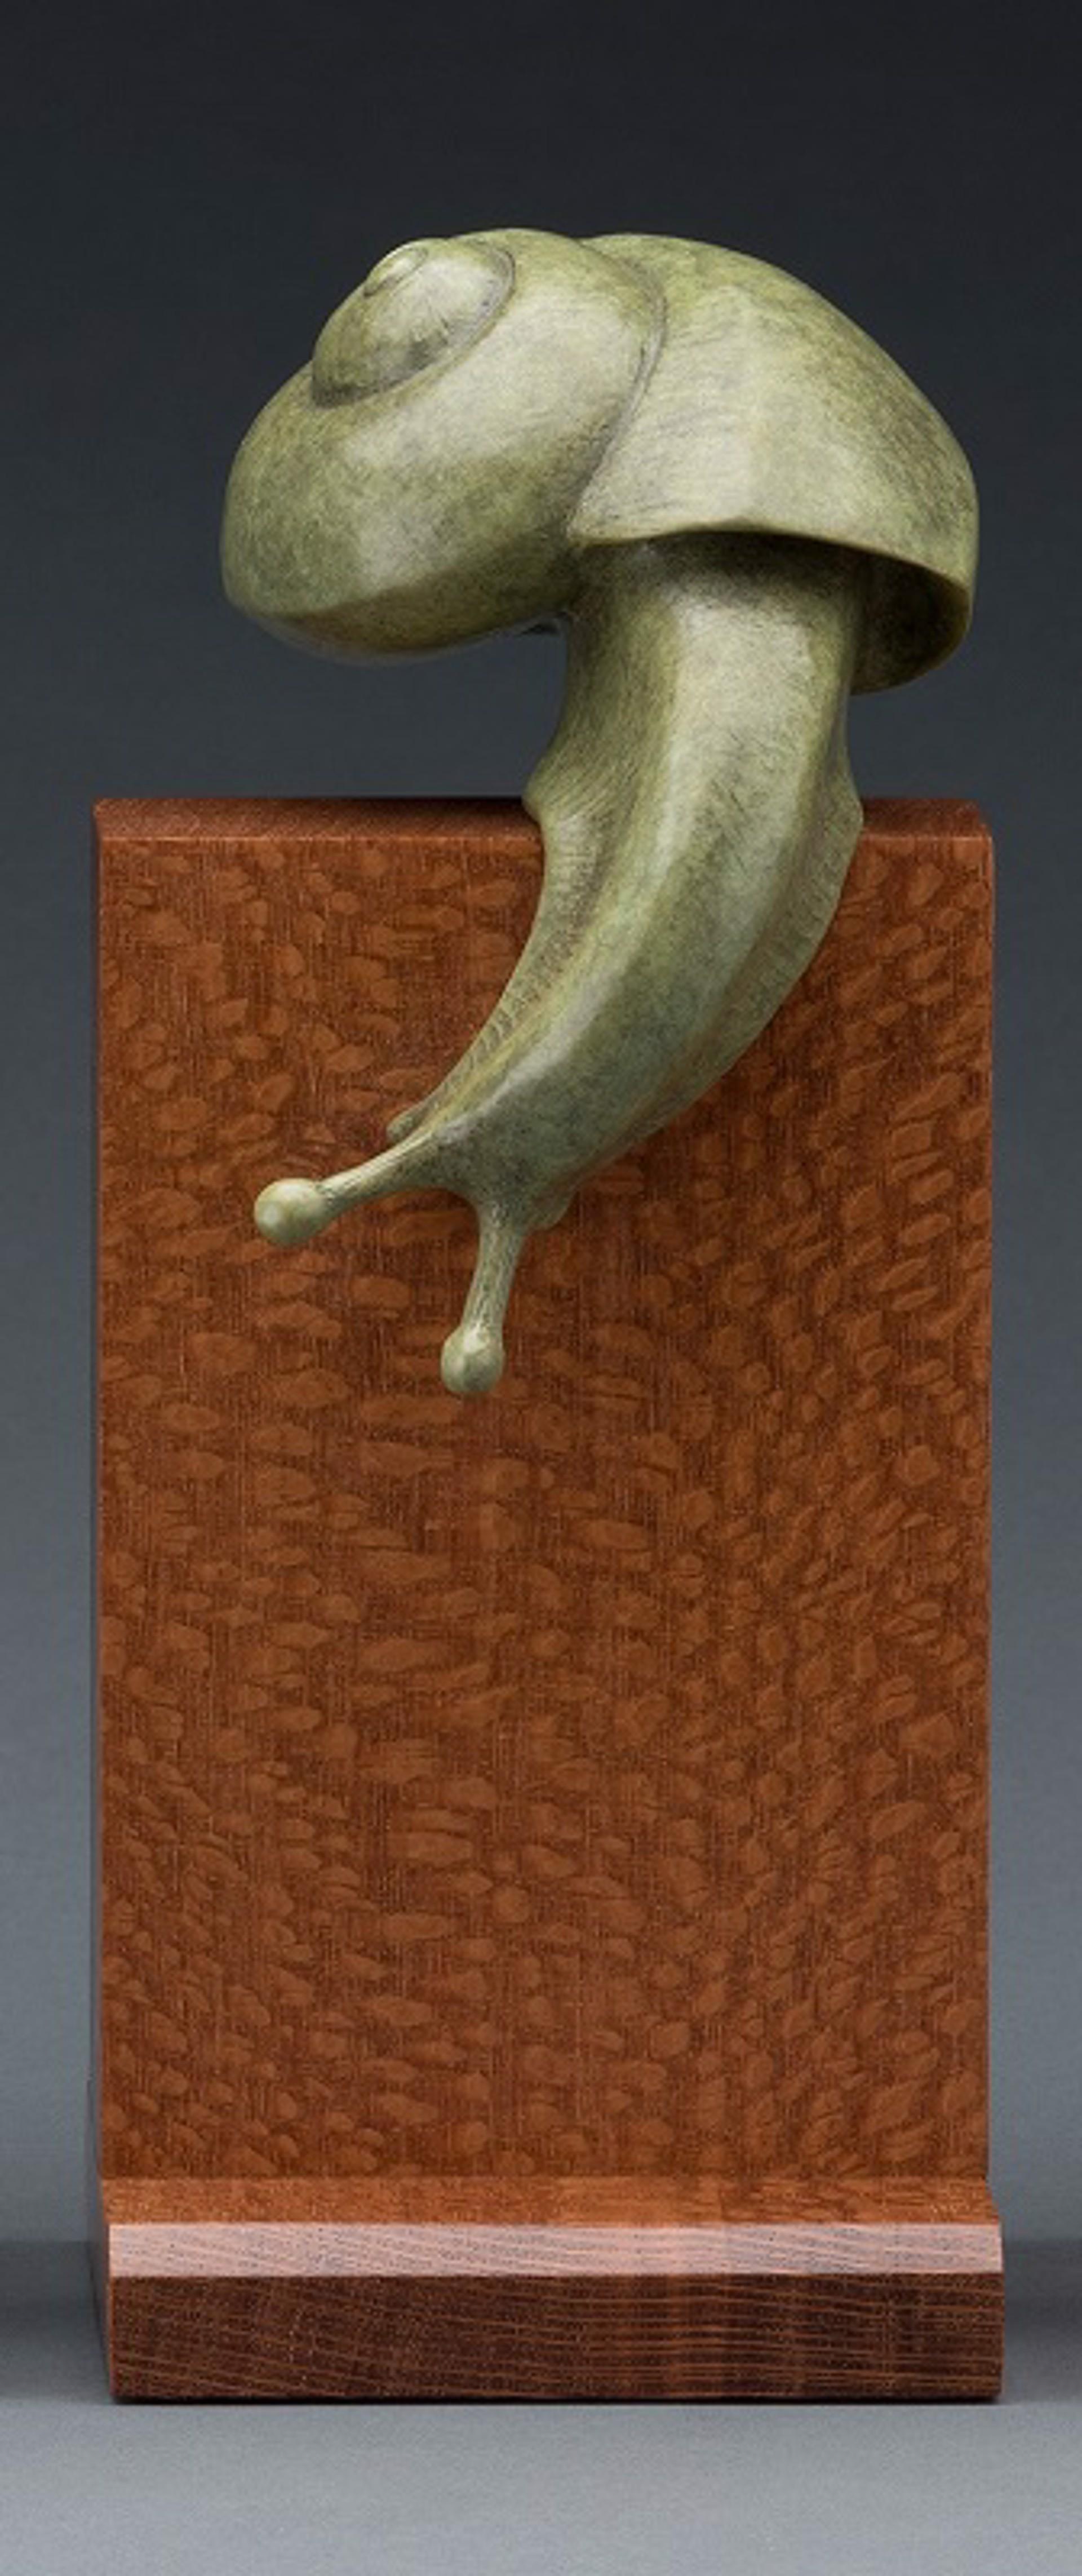 Snail by Tony Hochstetler